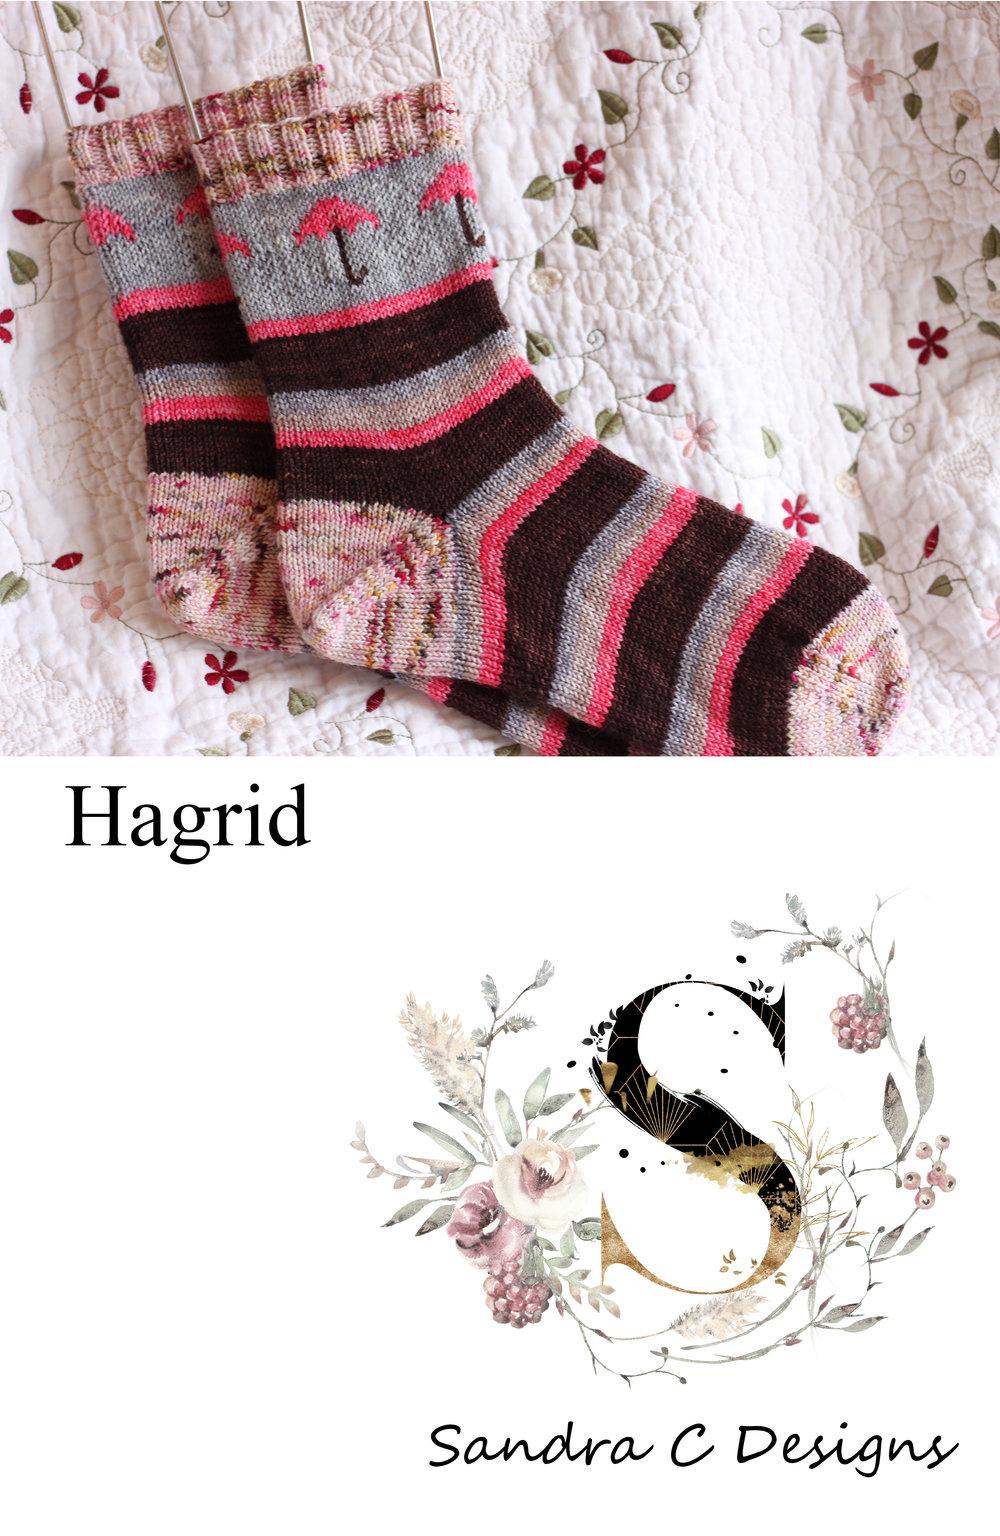 hagridcover1.jpg